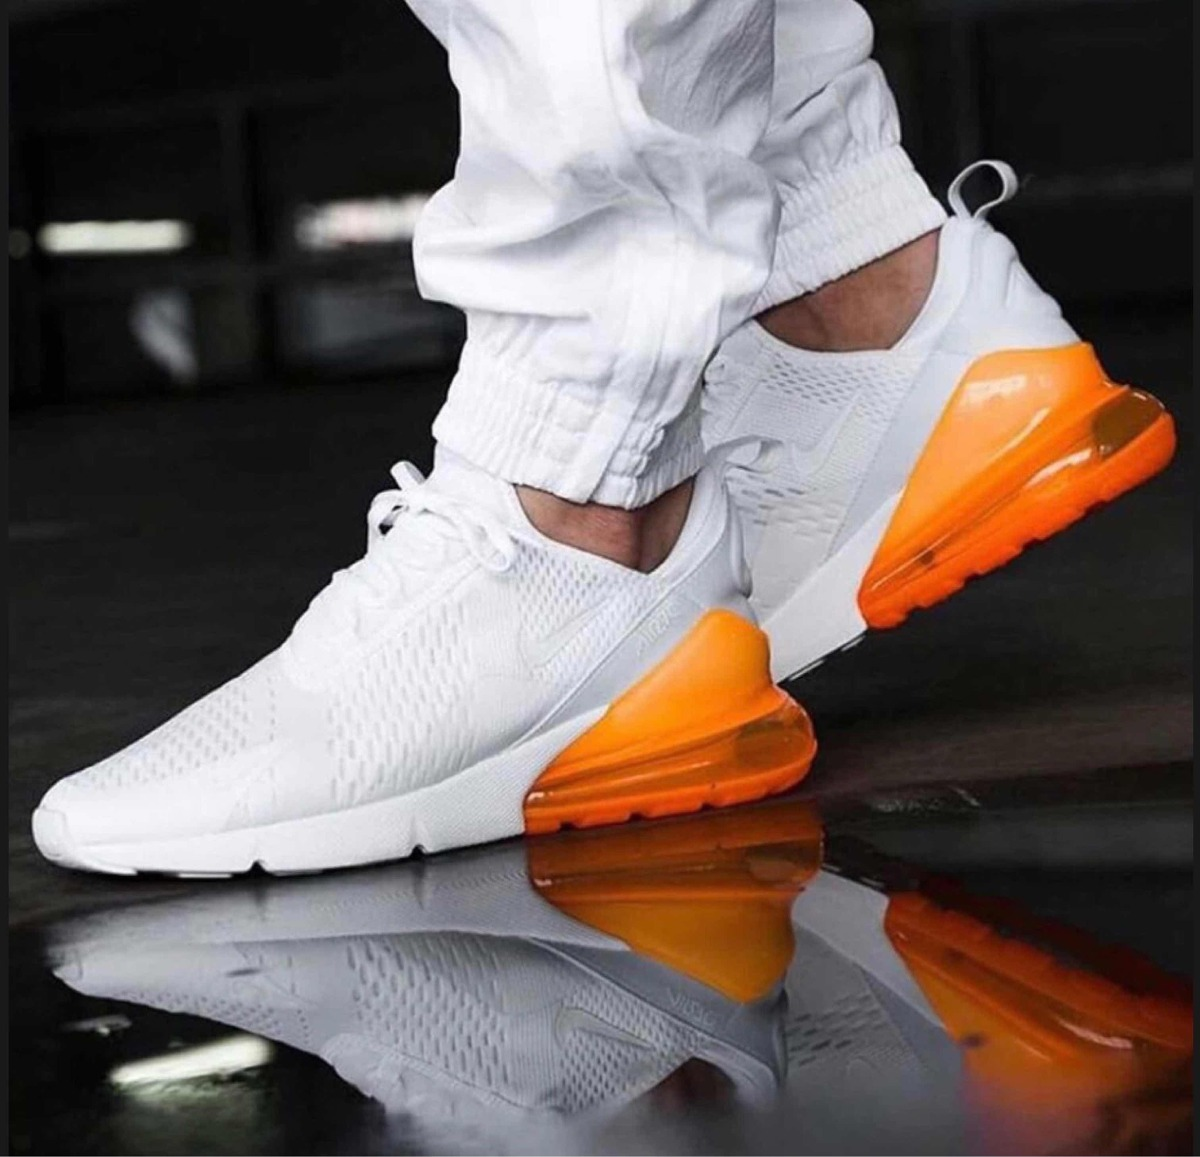 Outlet Nike Air Max 270 Blanco Total Naranja BHHLUMRRR